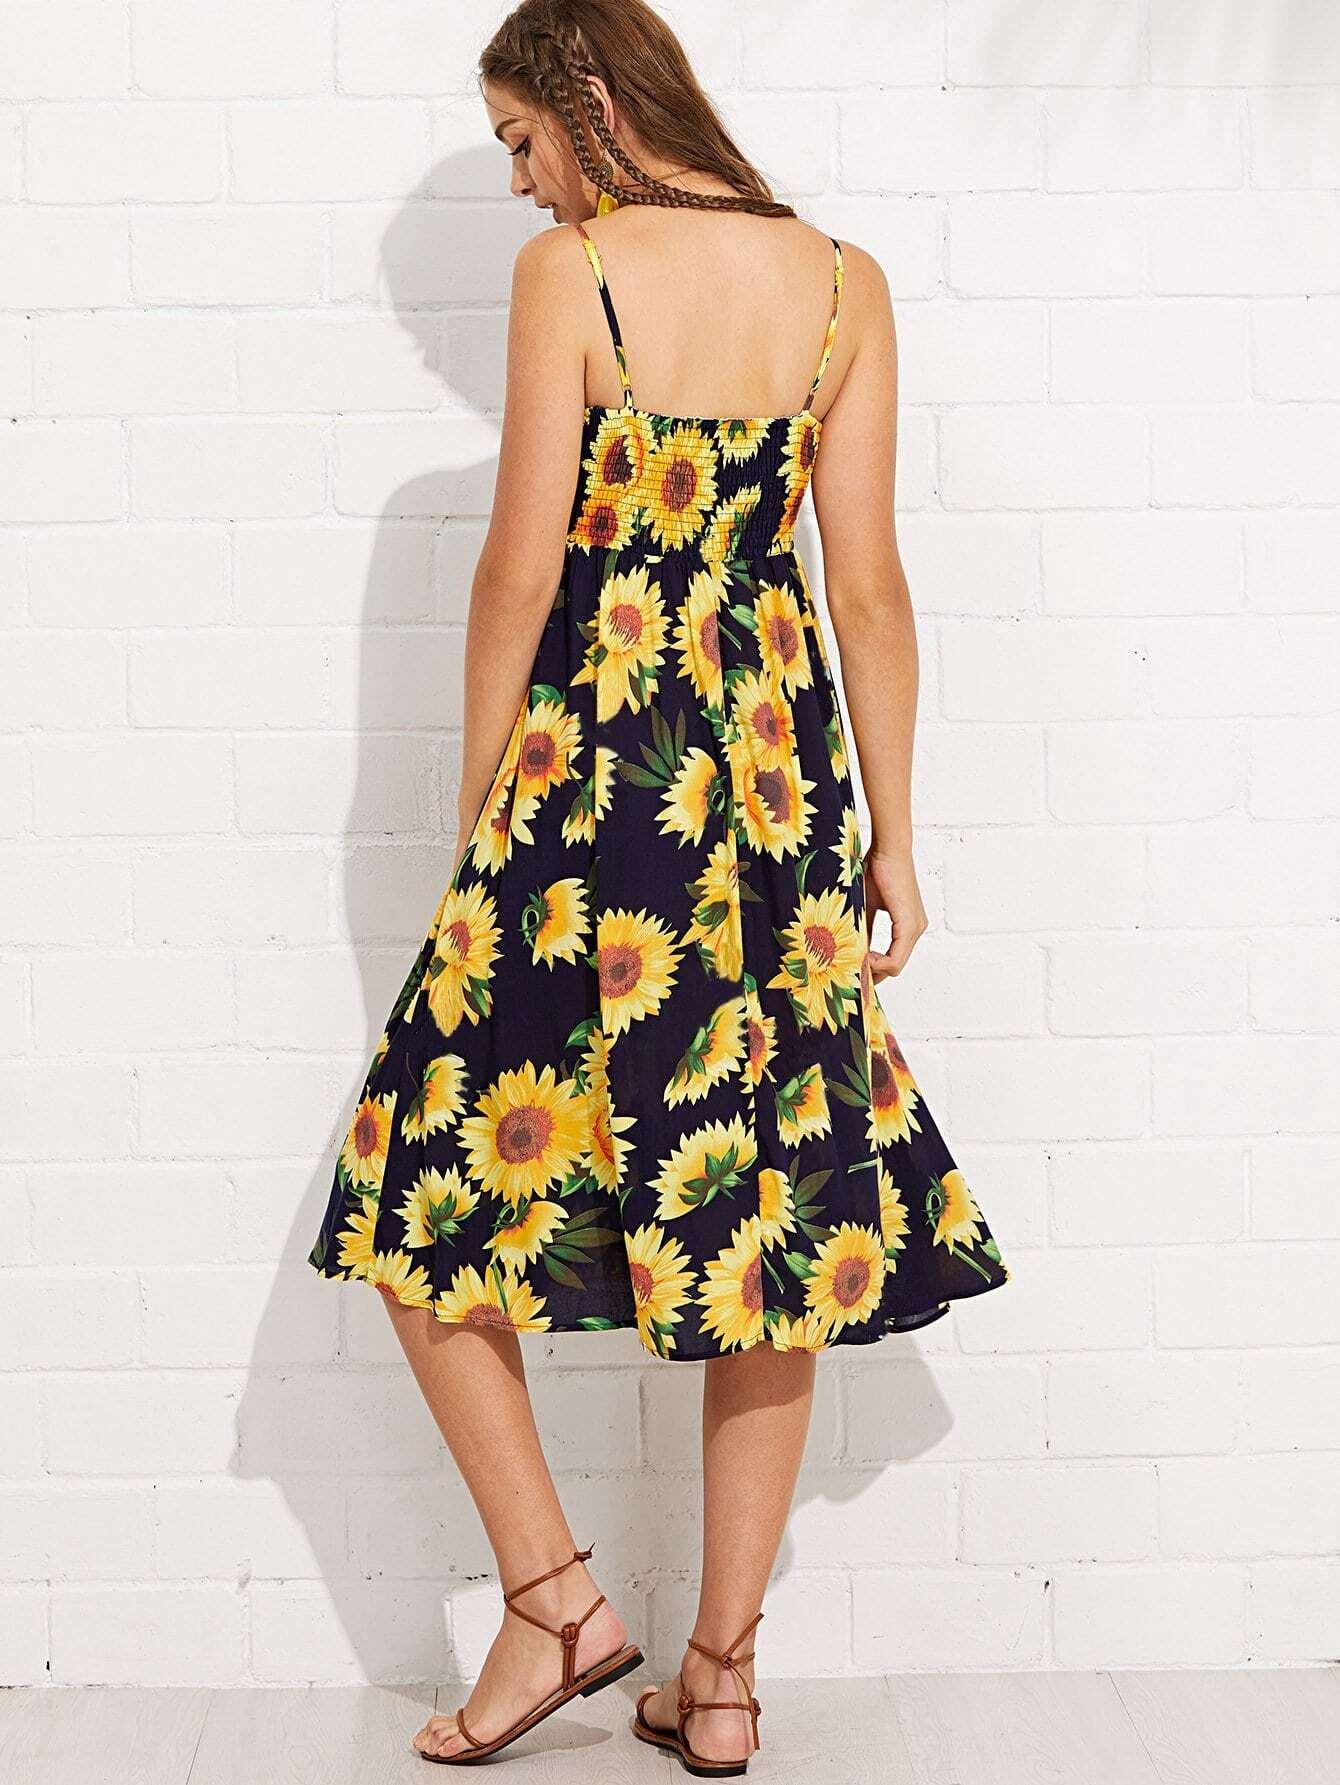 1c3baaa244c3 2018 Summer New Fashion Dresses Sexy Sunflower Pineapple ...